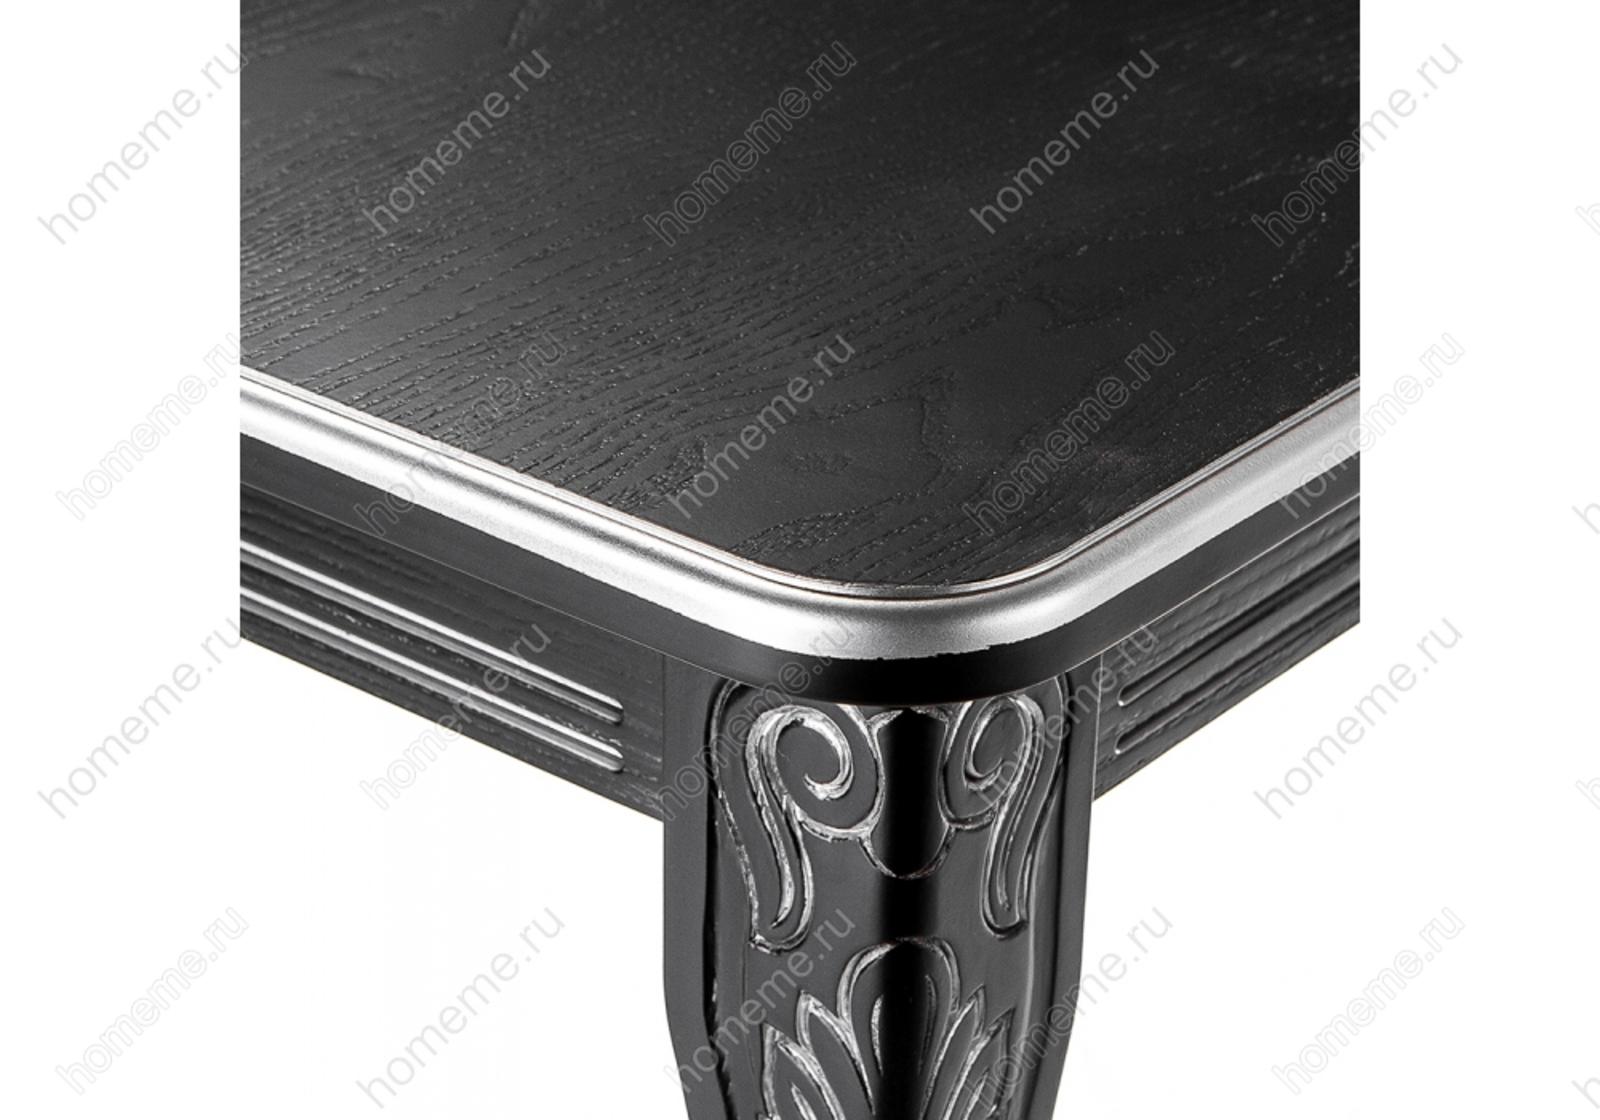 Стол деревянный Каллисто патина серебро 309304 Каллисто патина серебро 309304 (15302)